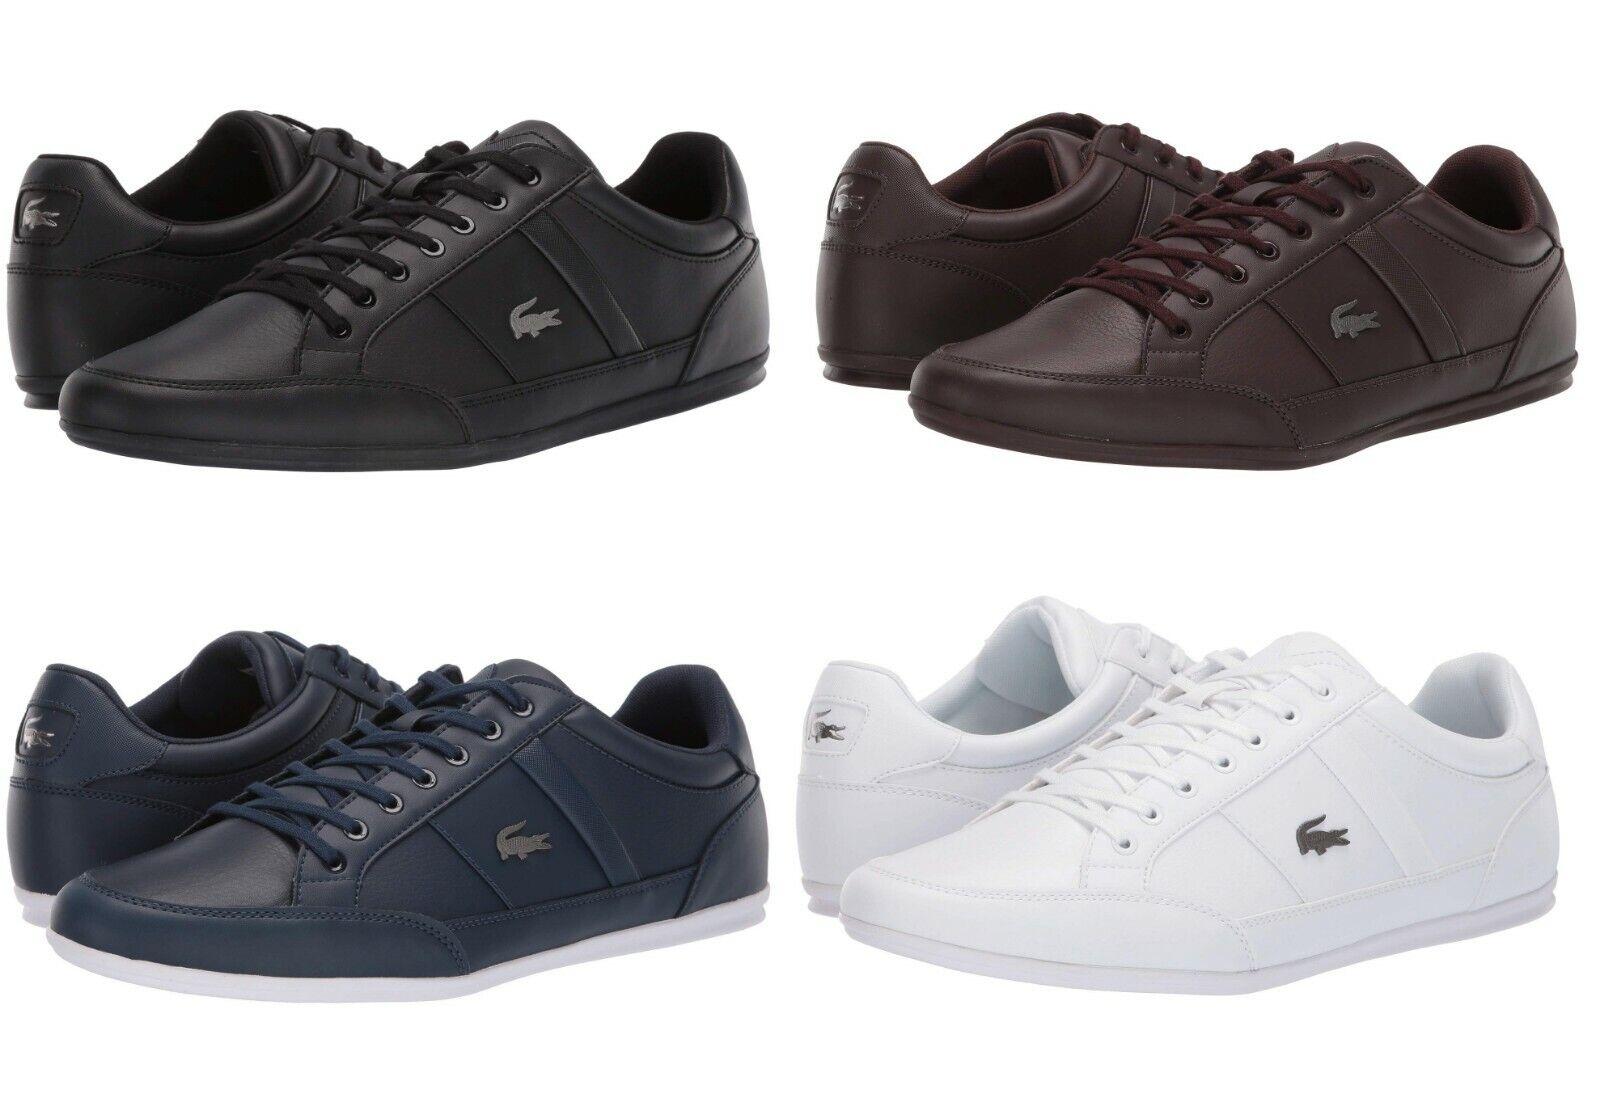 Lacoste Chaymon BL Men's Casual Croc Logo Shoes Sneakers Black Brown Navy White